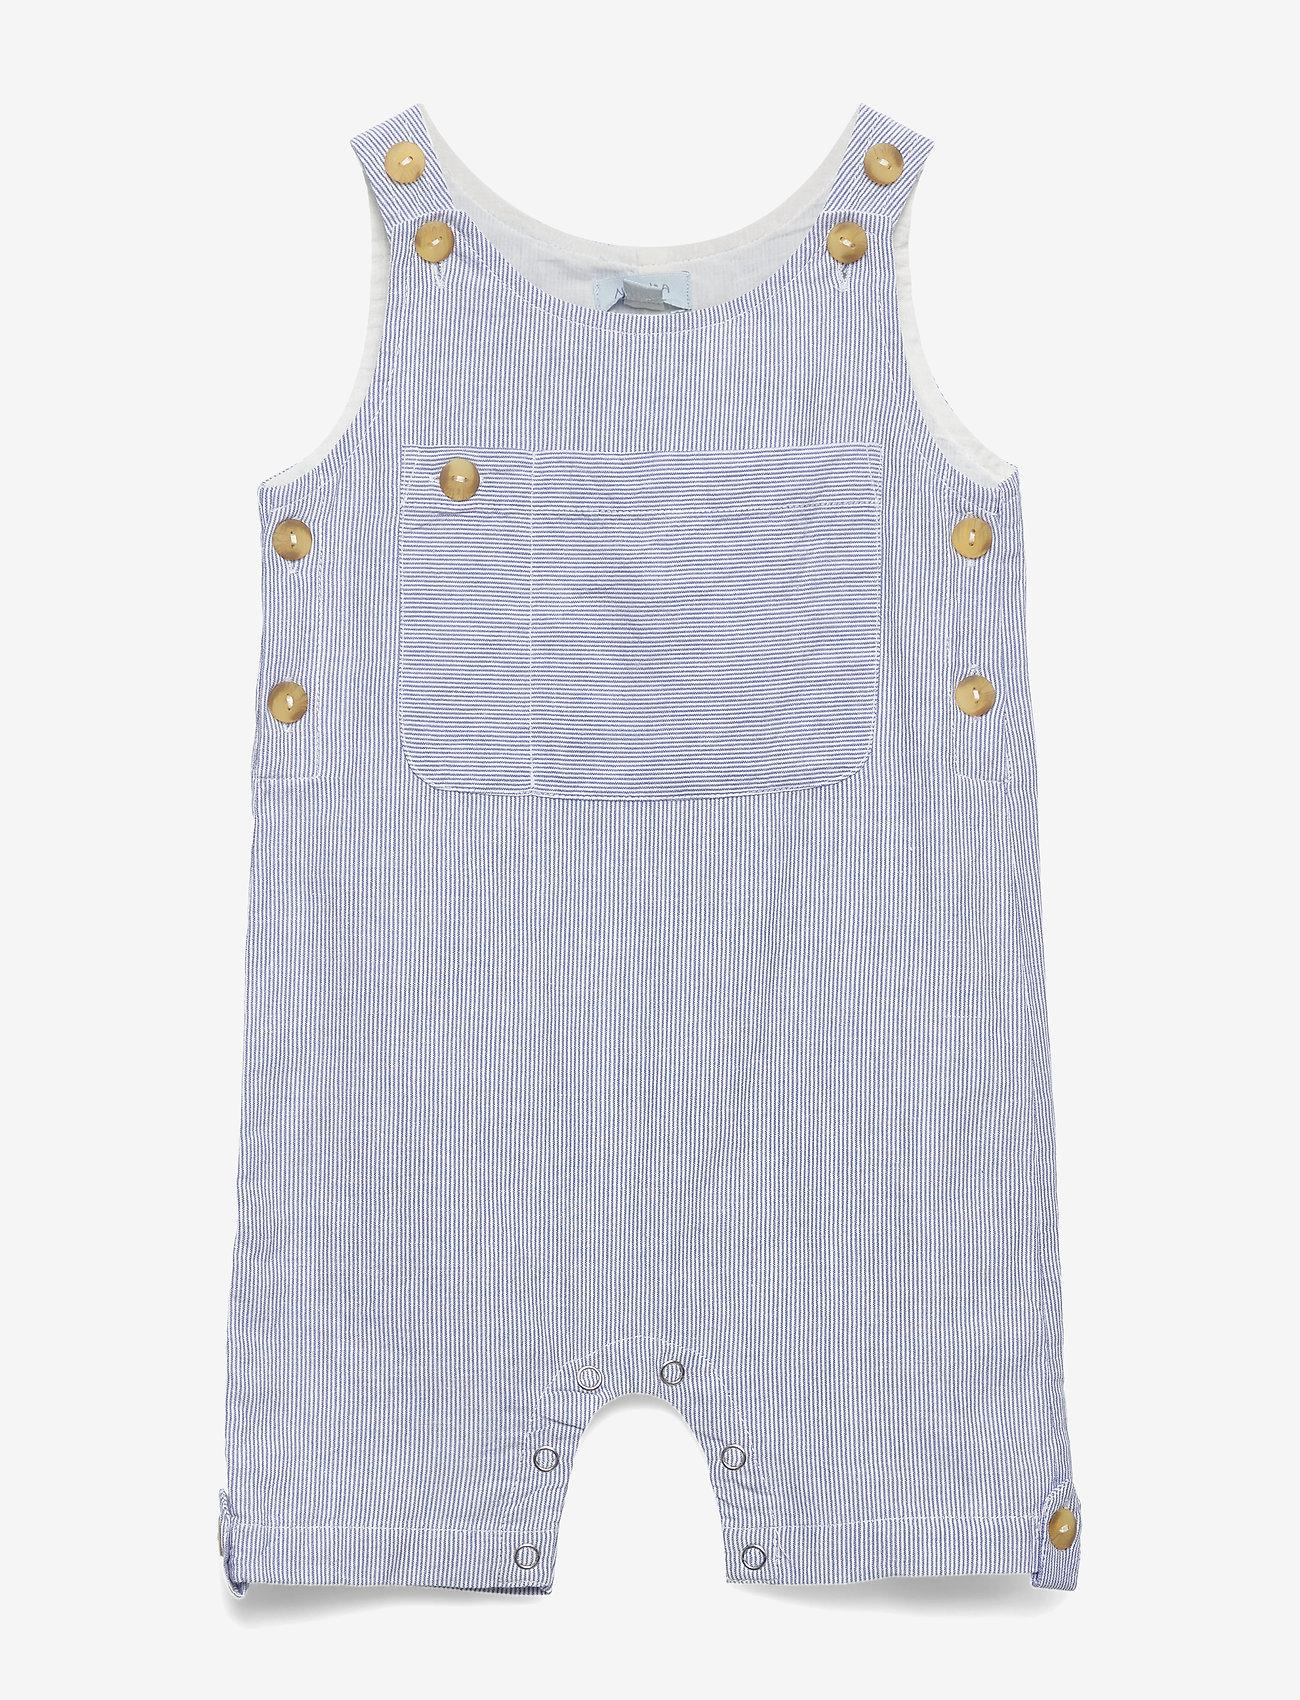 Noa Noa Miniature - Overall - dungarees - blue sapphire - 0